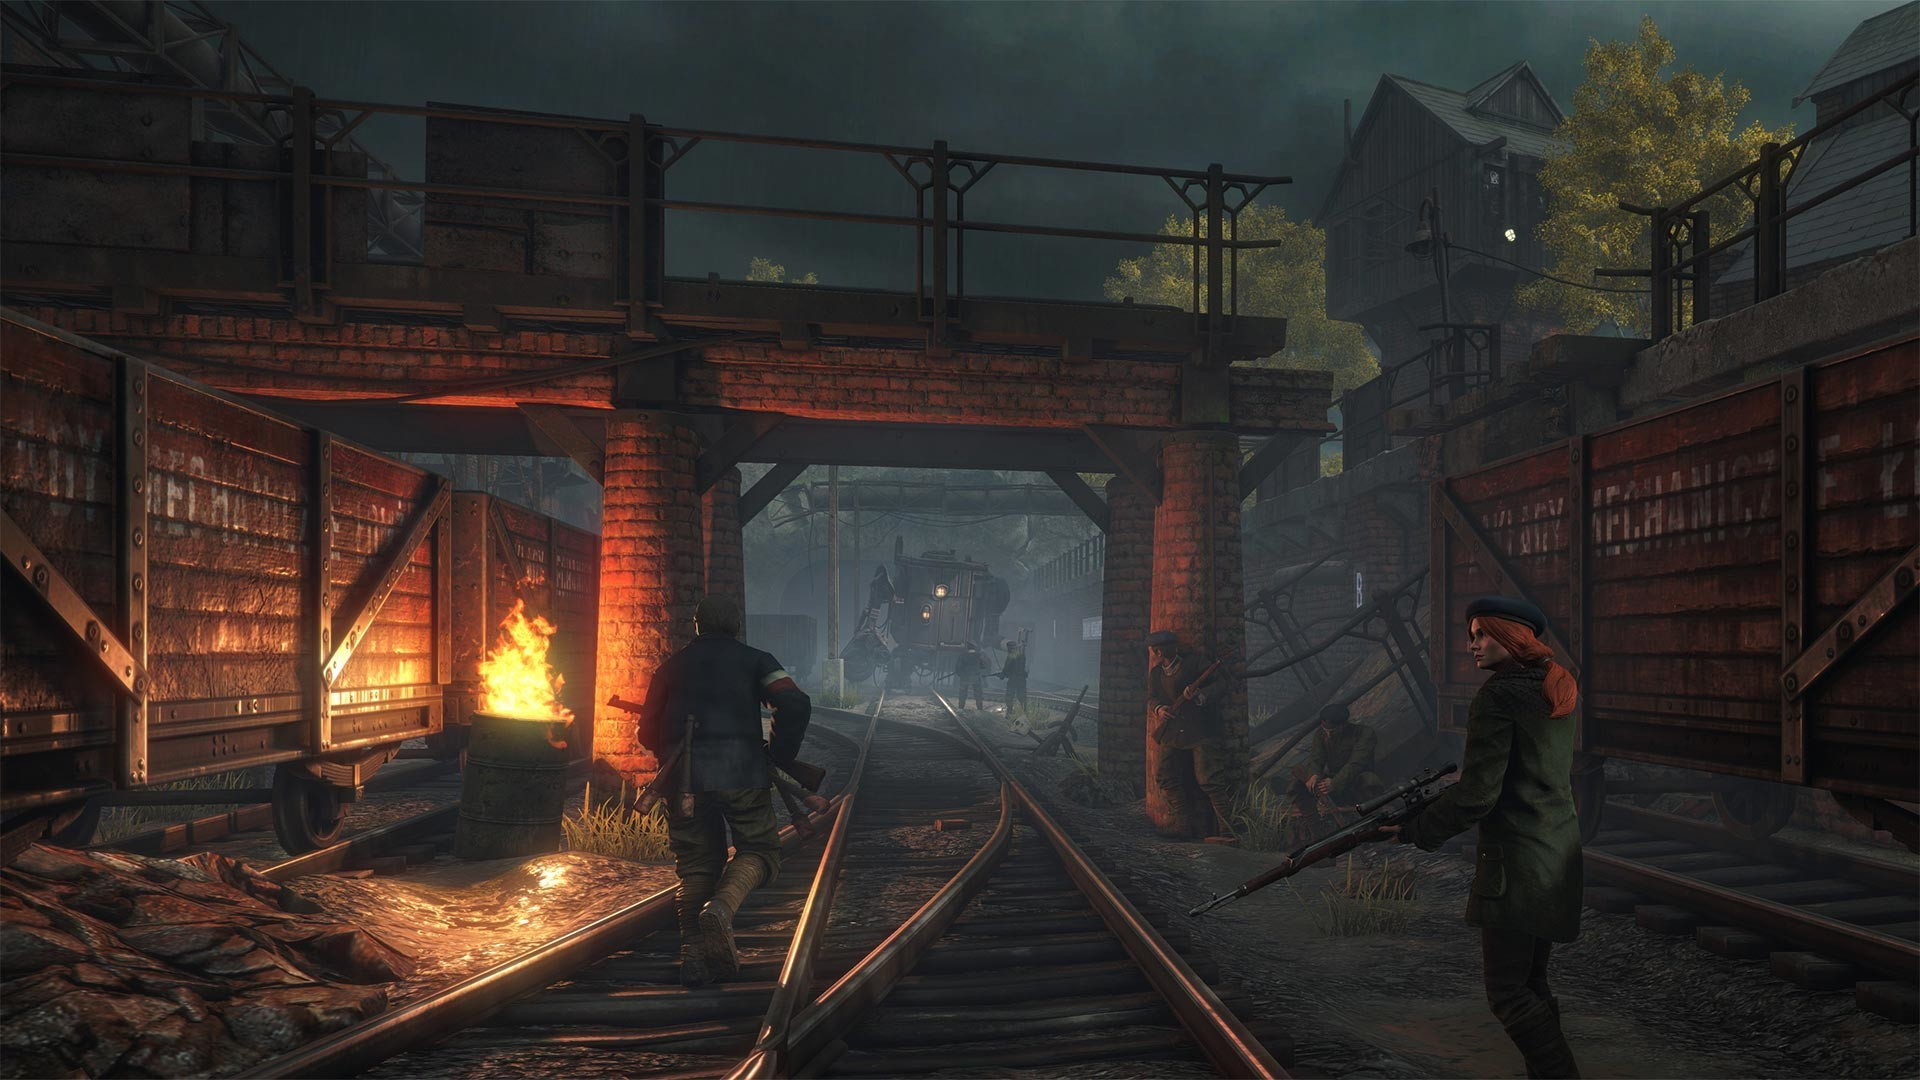 Screenshot for the game Iron Harvest - Deluxe Edition v.1.0.8.1796 [GOG] (2020) download torrent License